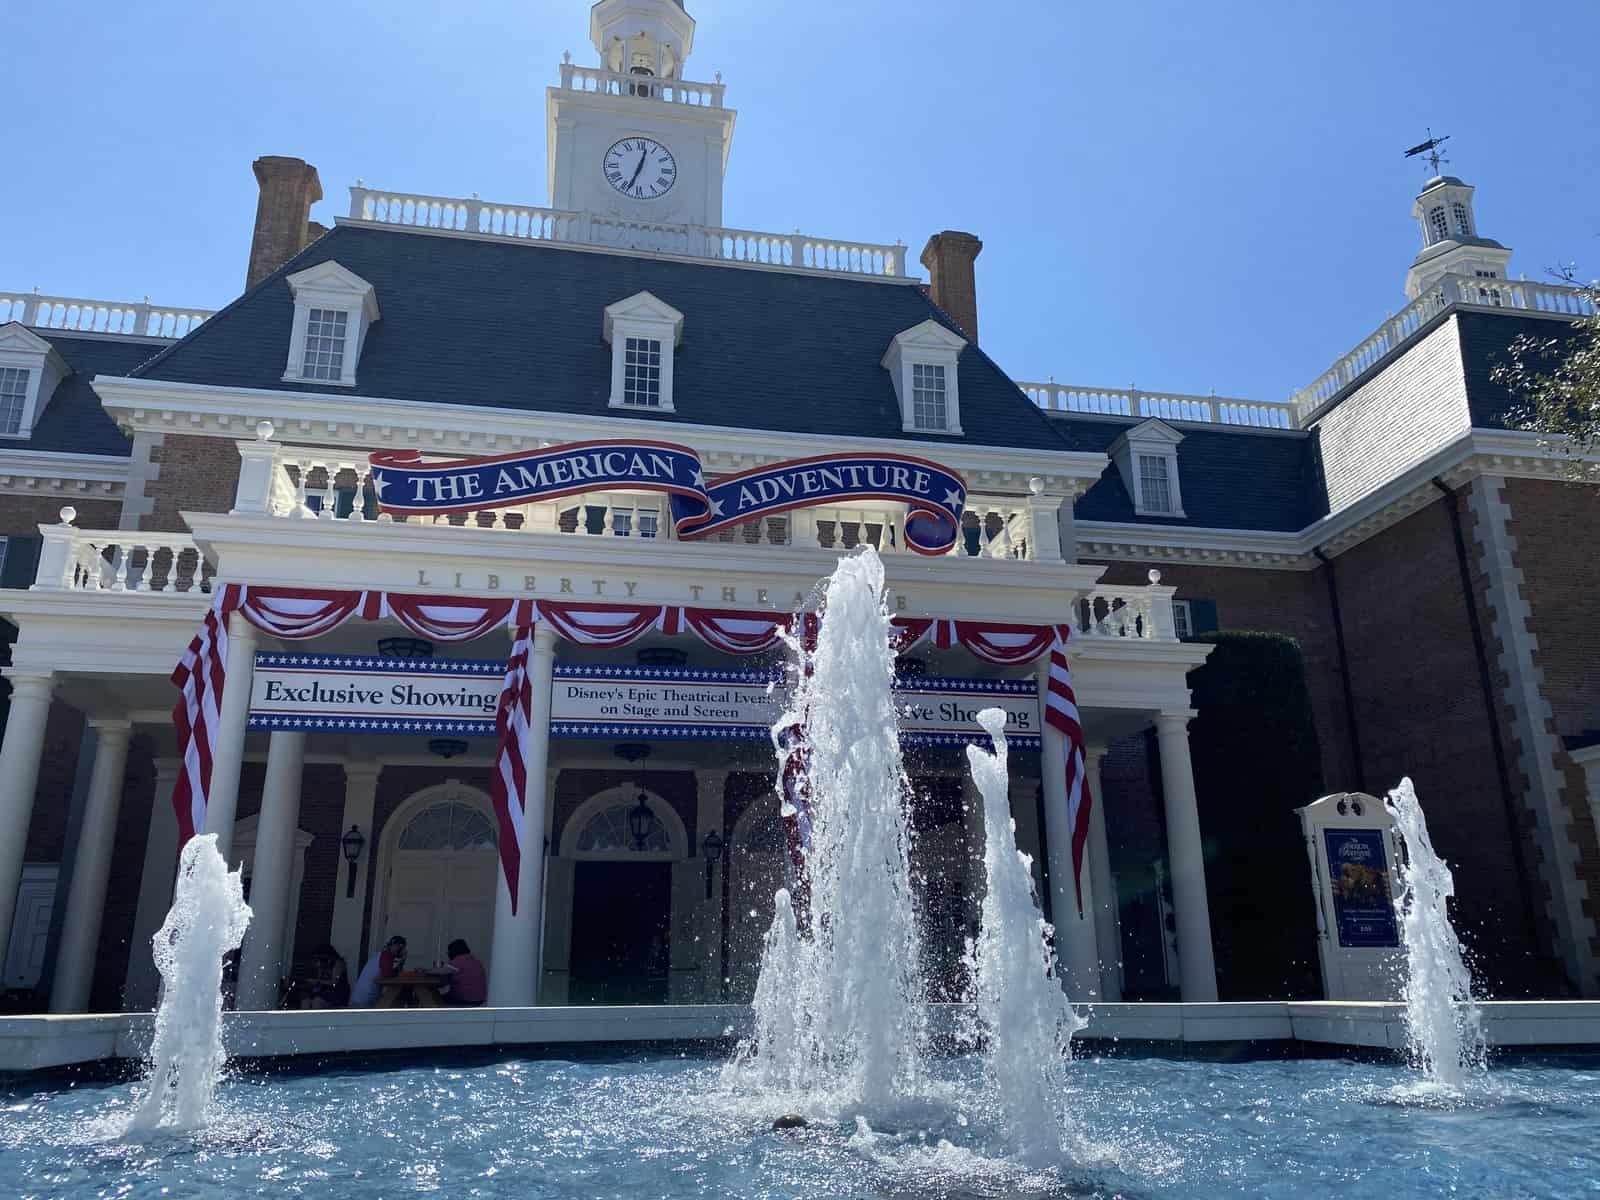 American Adventure Pavilion